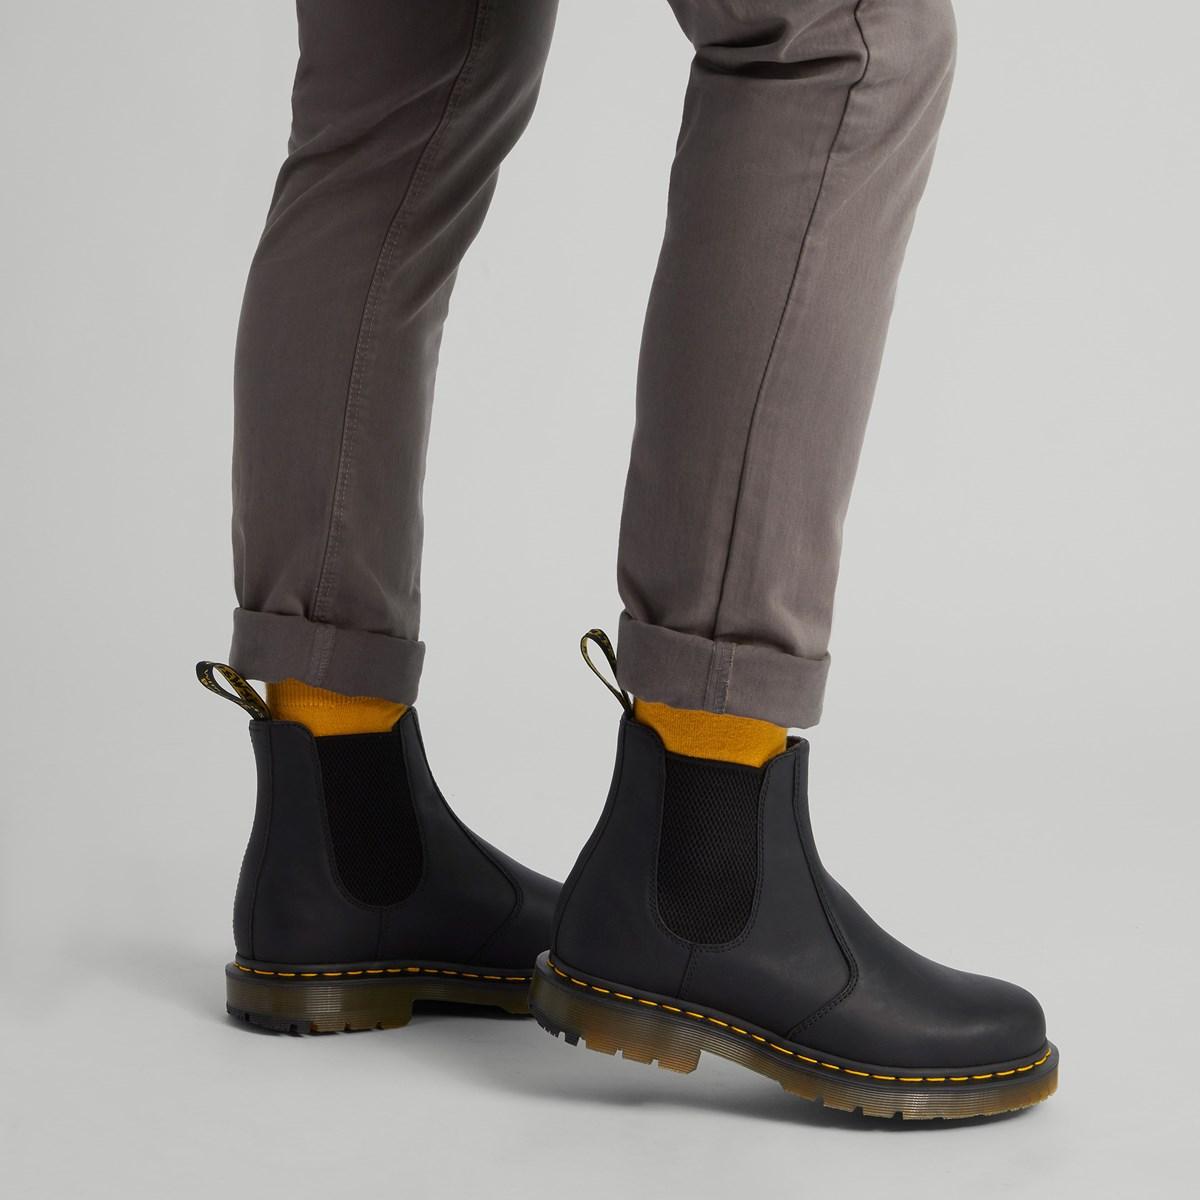 doc martins winter boots